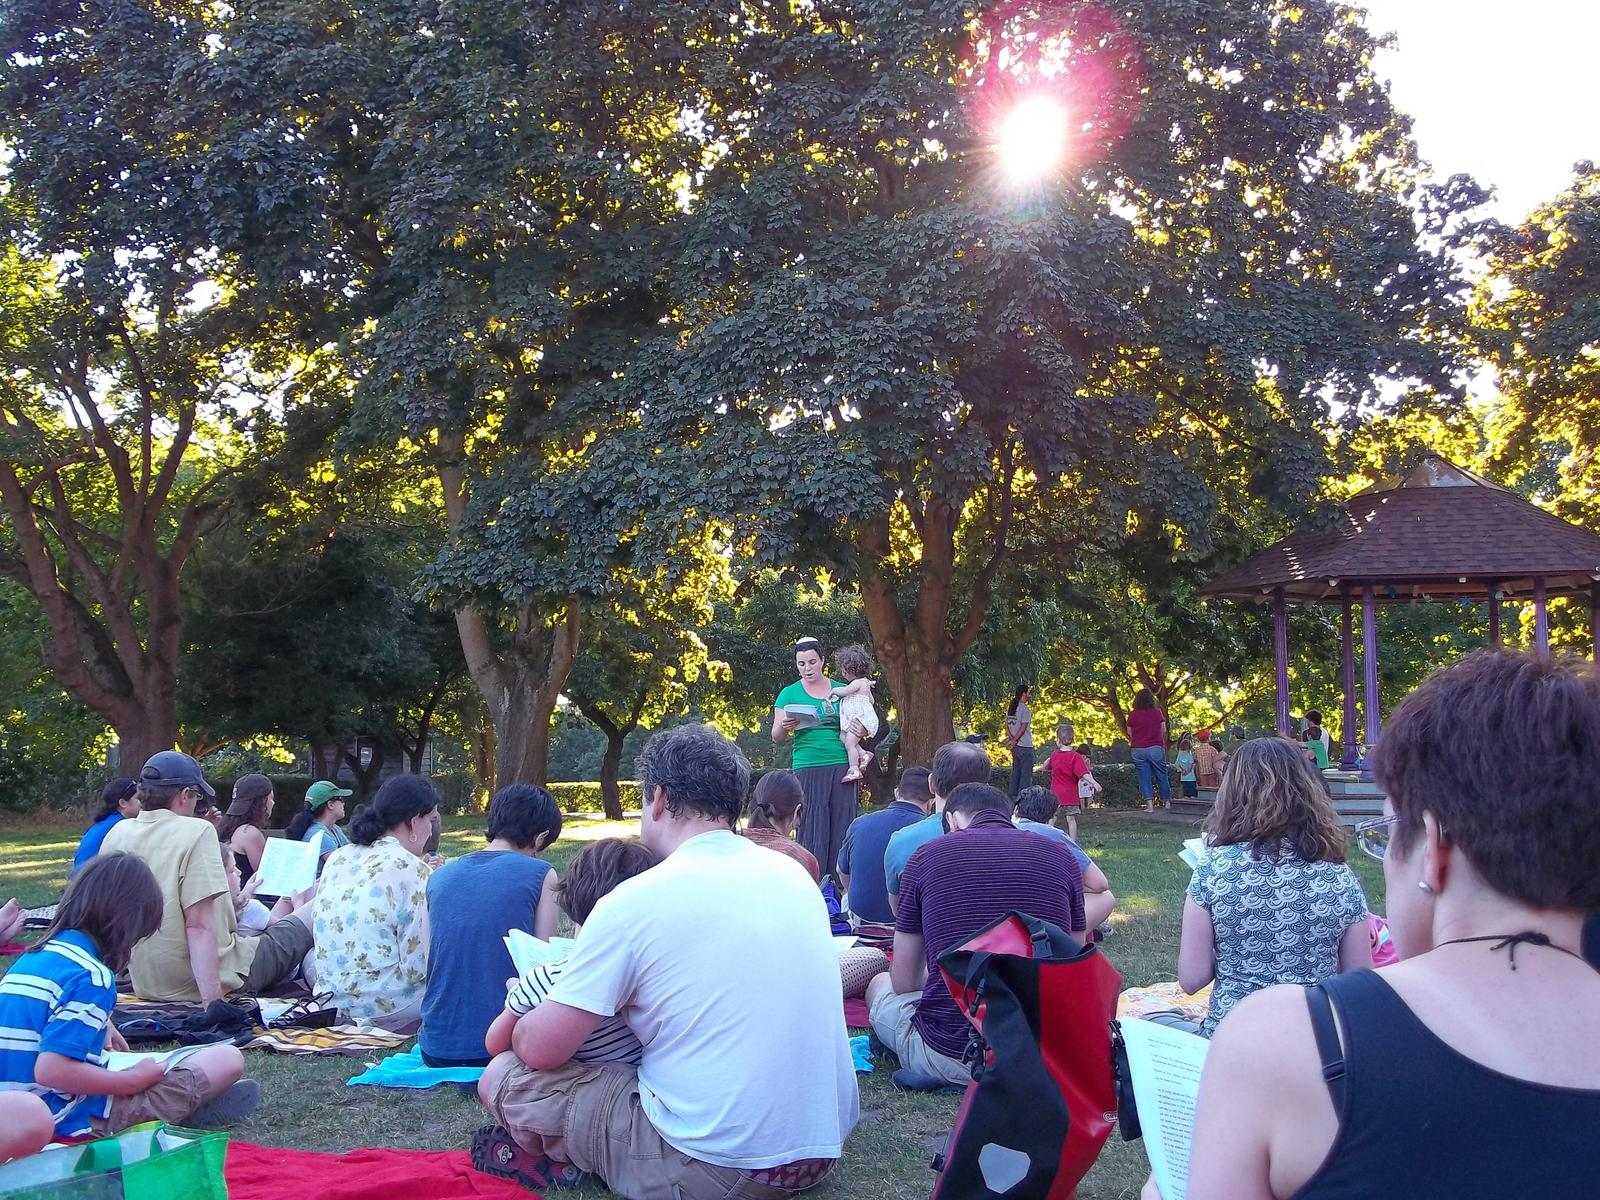 Rabbi Nussbaum leading a Shabbat service in the park.